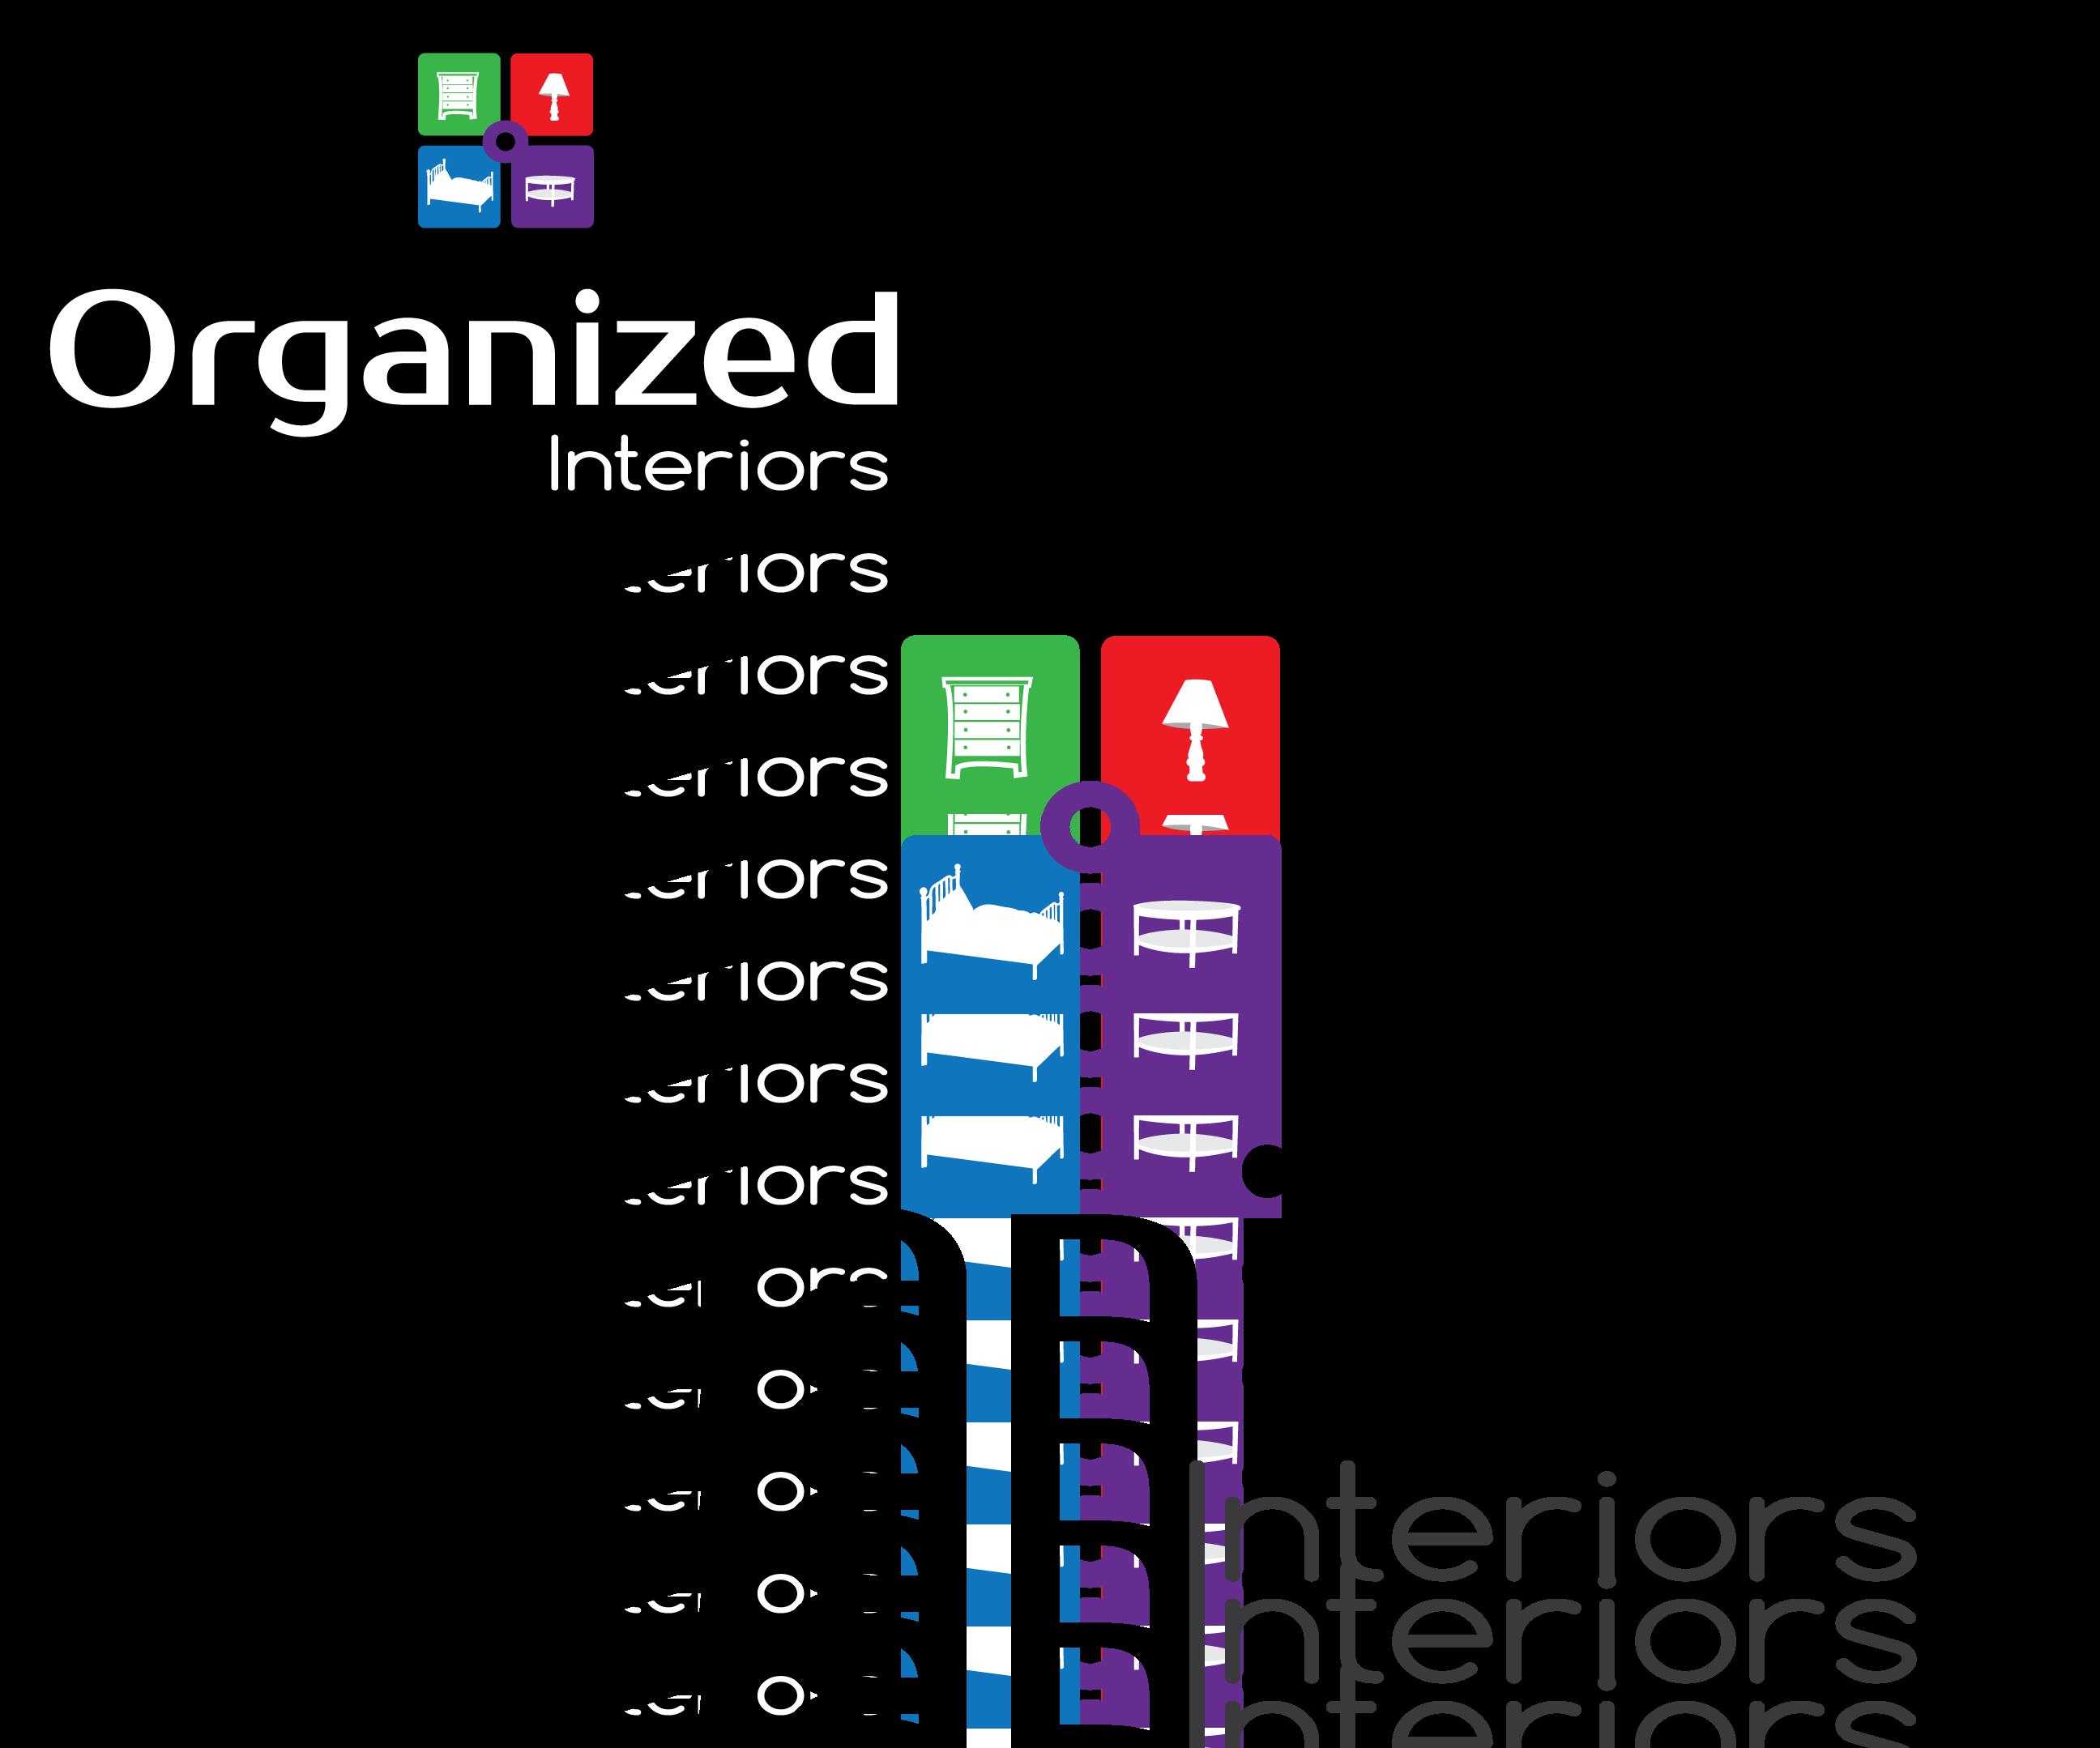 Logo Design by 354studio - Entry No. 158 in the Logo Design Contest Imaginative Logo Design for Organized Interiors.